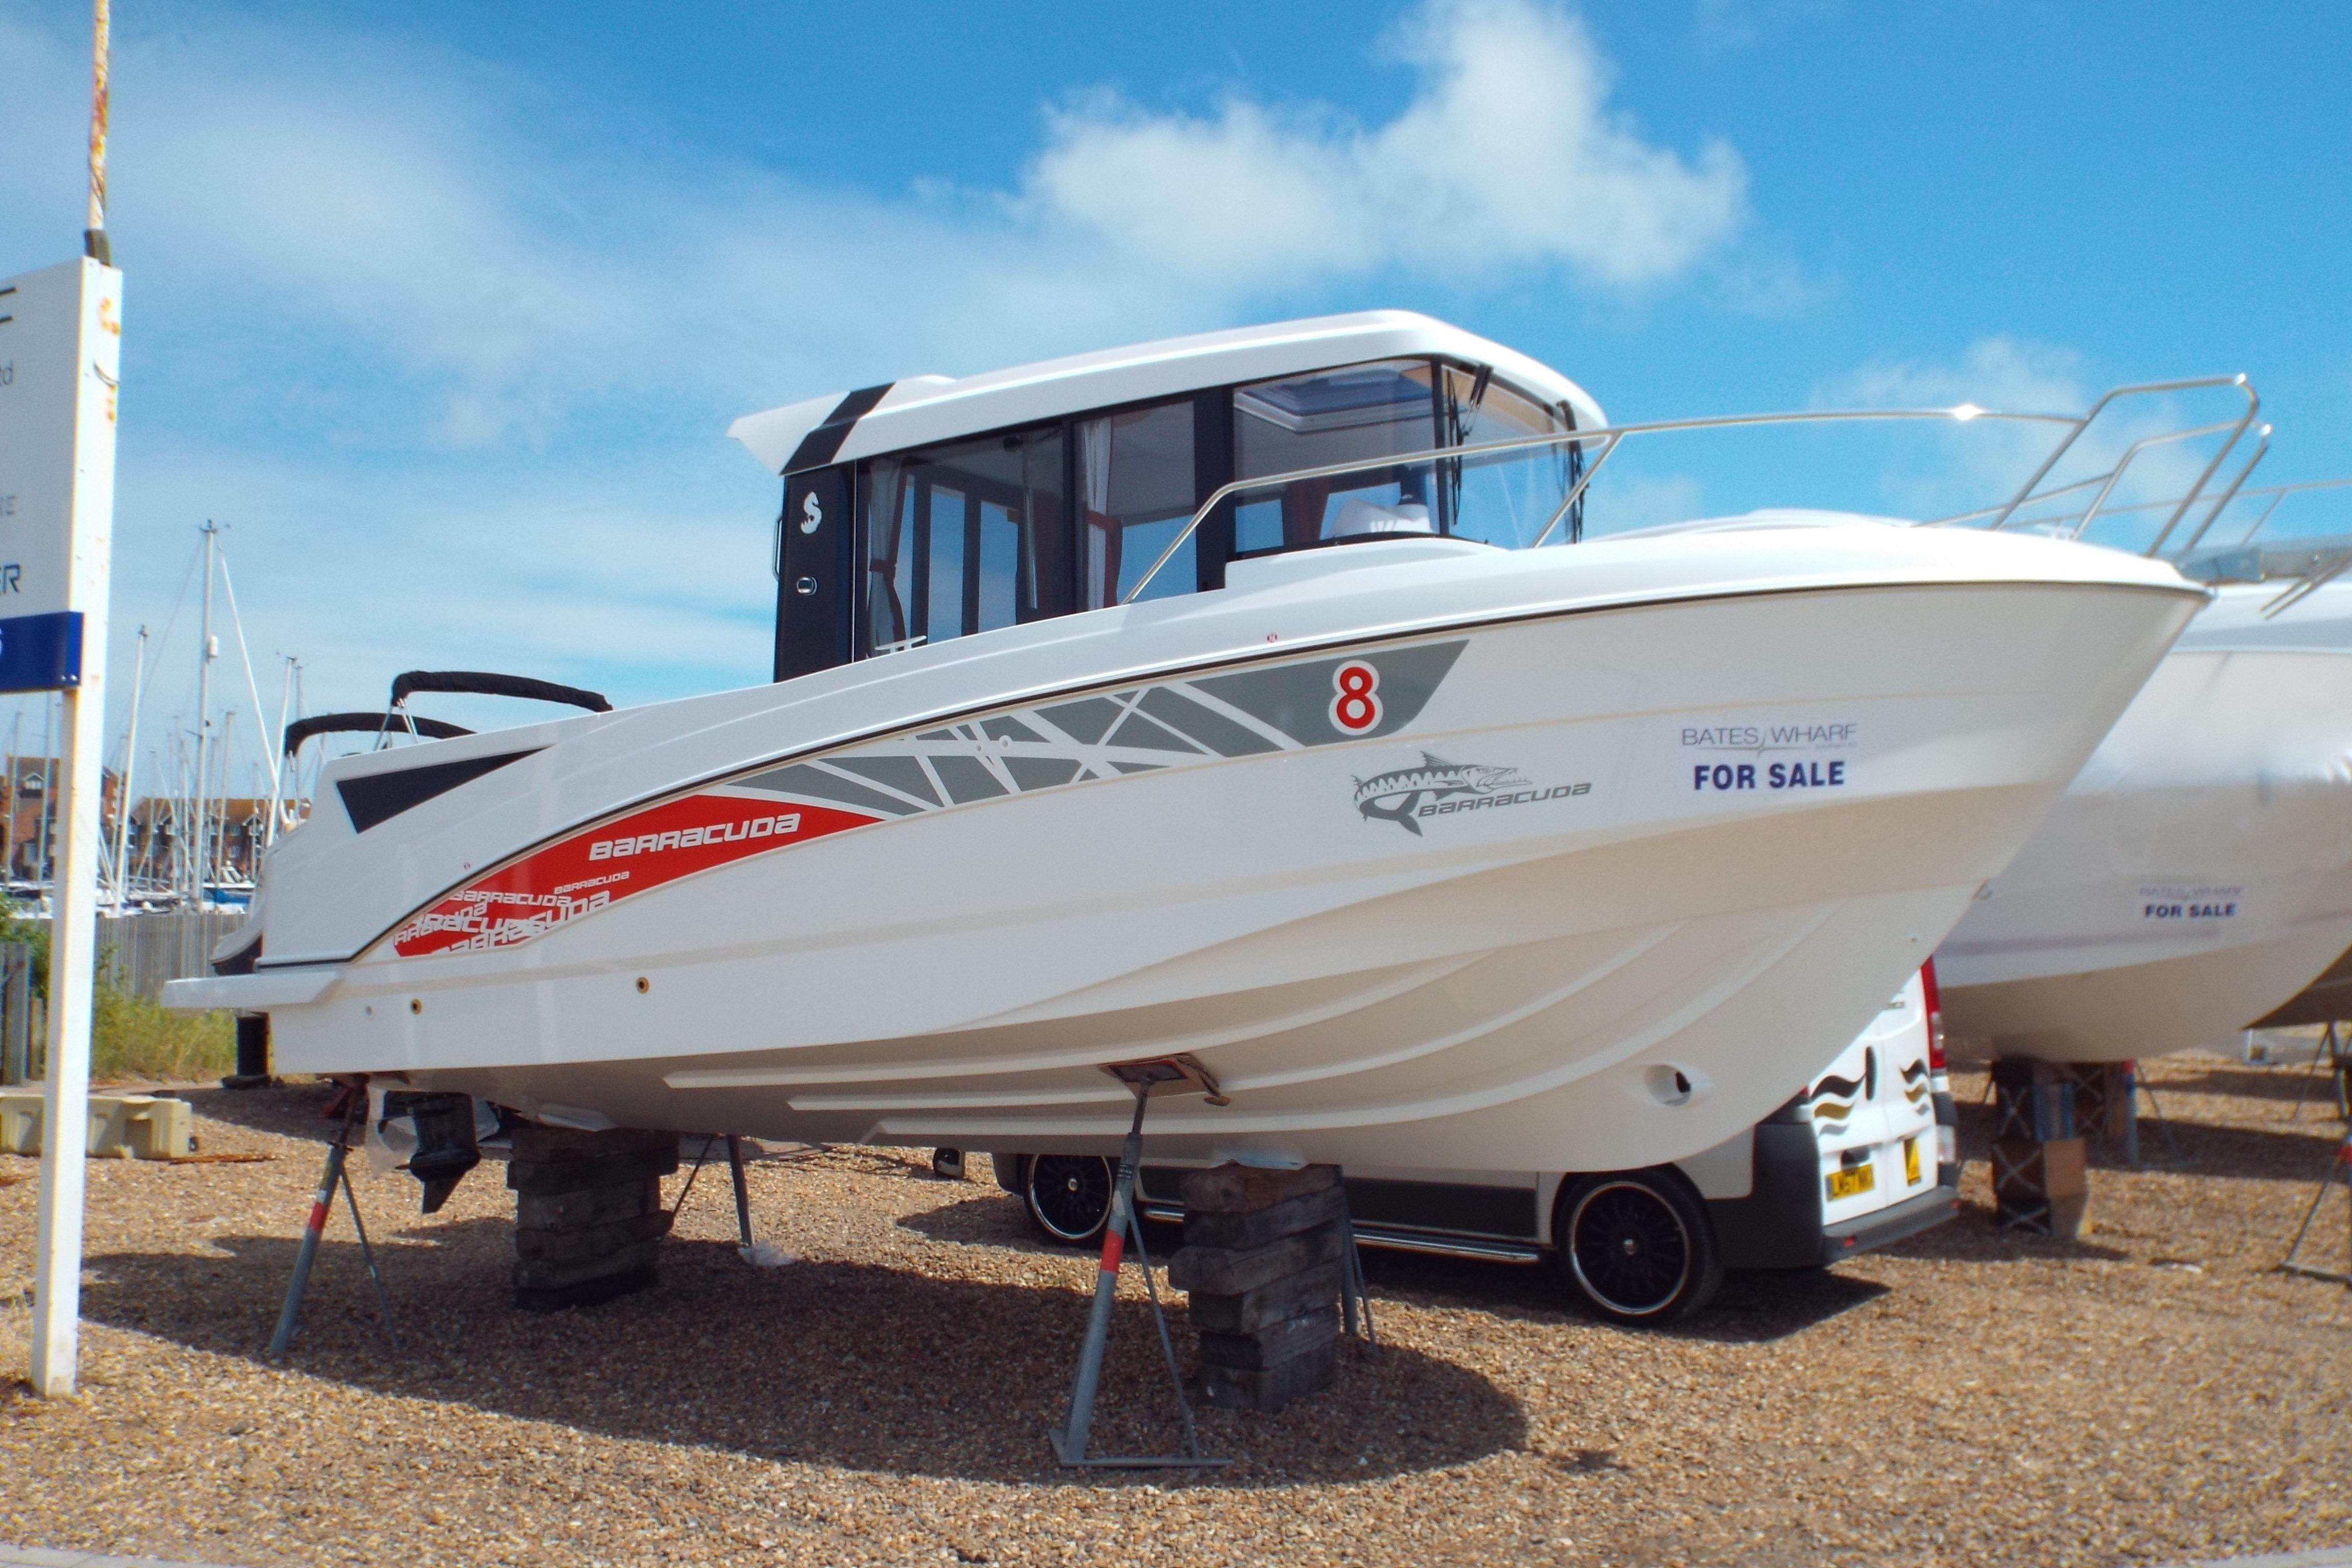 2016 beneteau barracuda 8 moteur bateau vendre. Black Bedroom Furniture Sets. Home Design Ideas